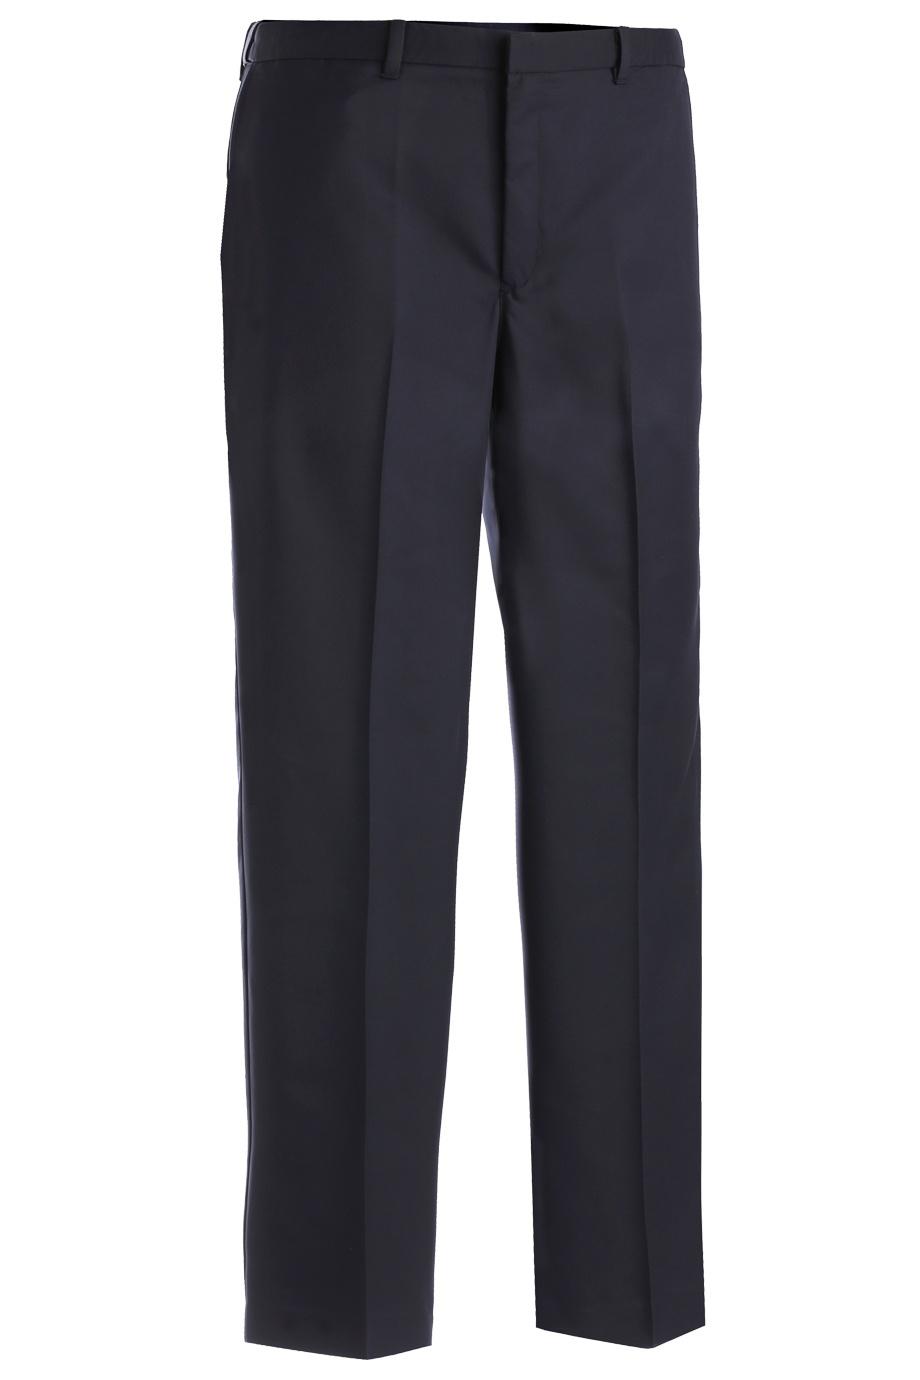 'Edwards 2574 Men's Microfiber Flat Front Pant'